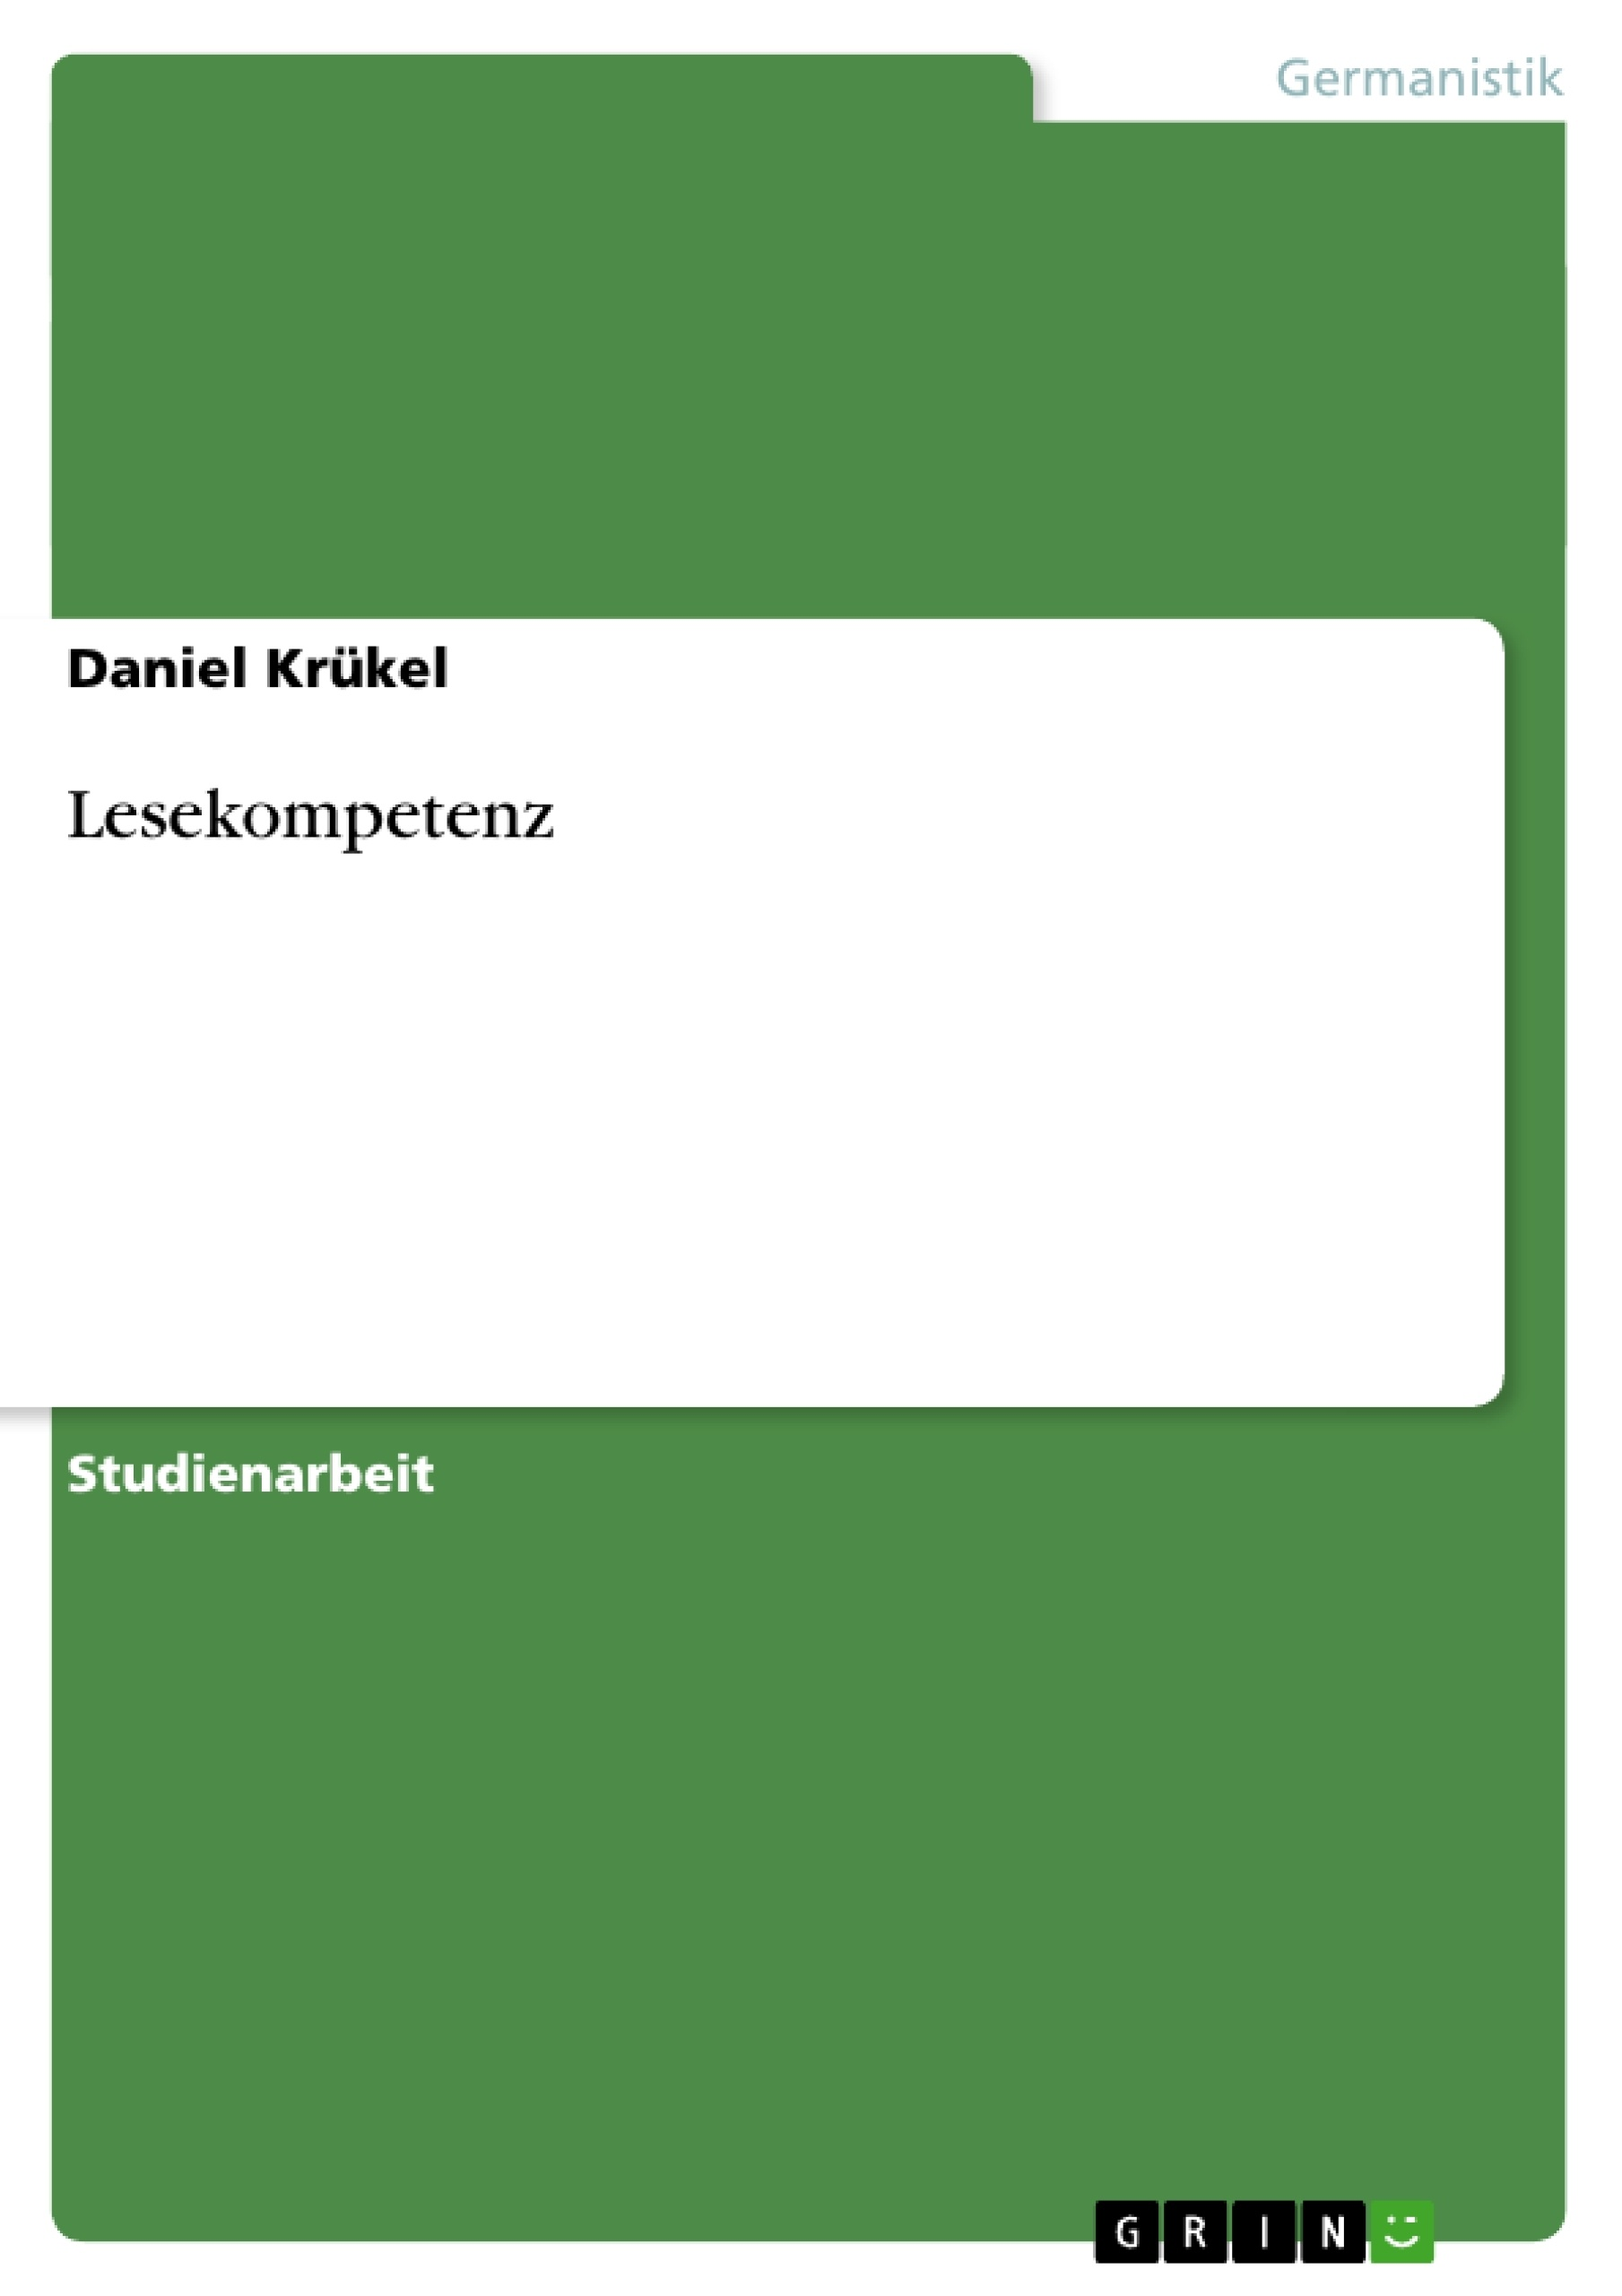 Titel: Lesekompetenz